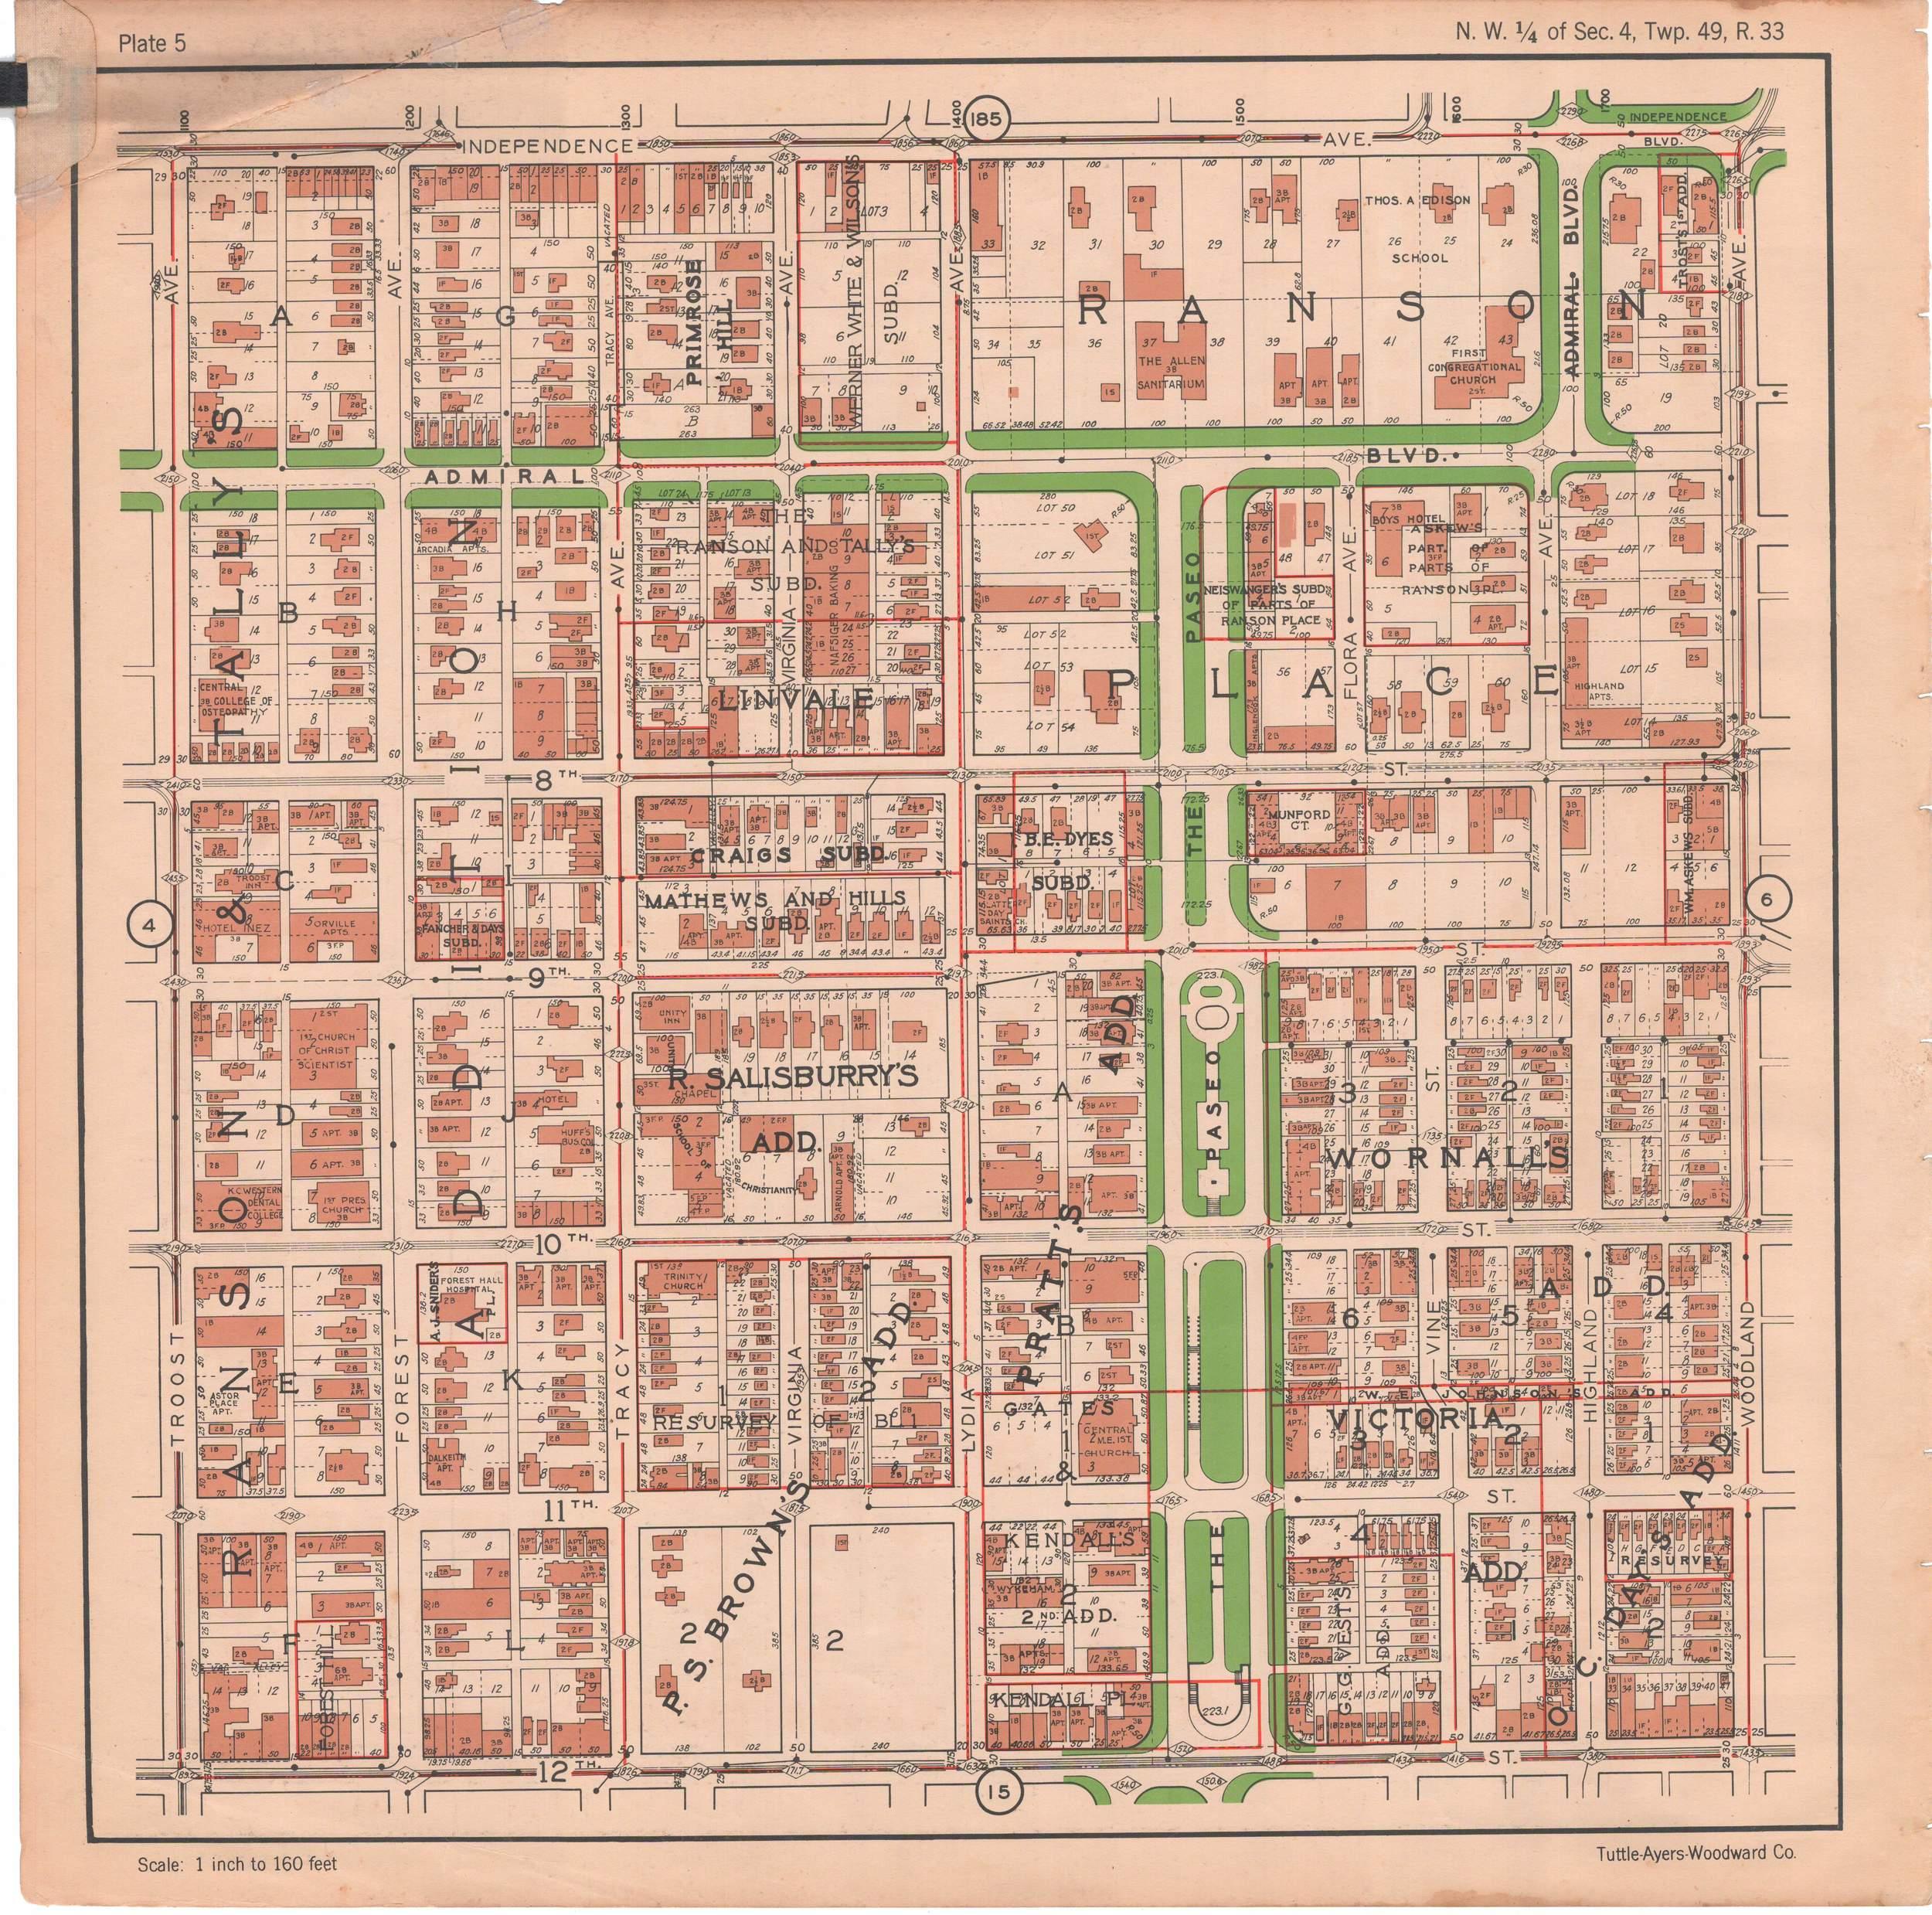 1925 TUTTLE_AYERS_Plate 5.JPG